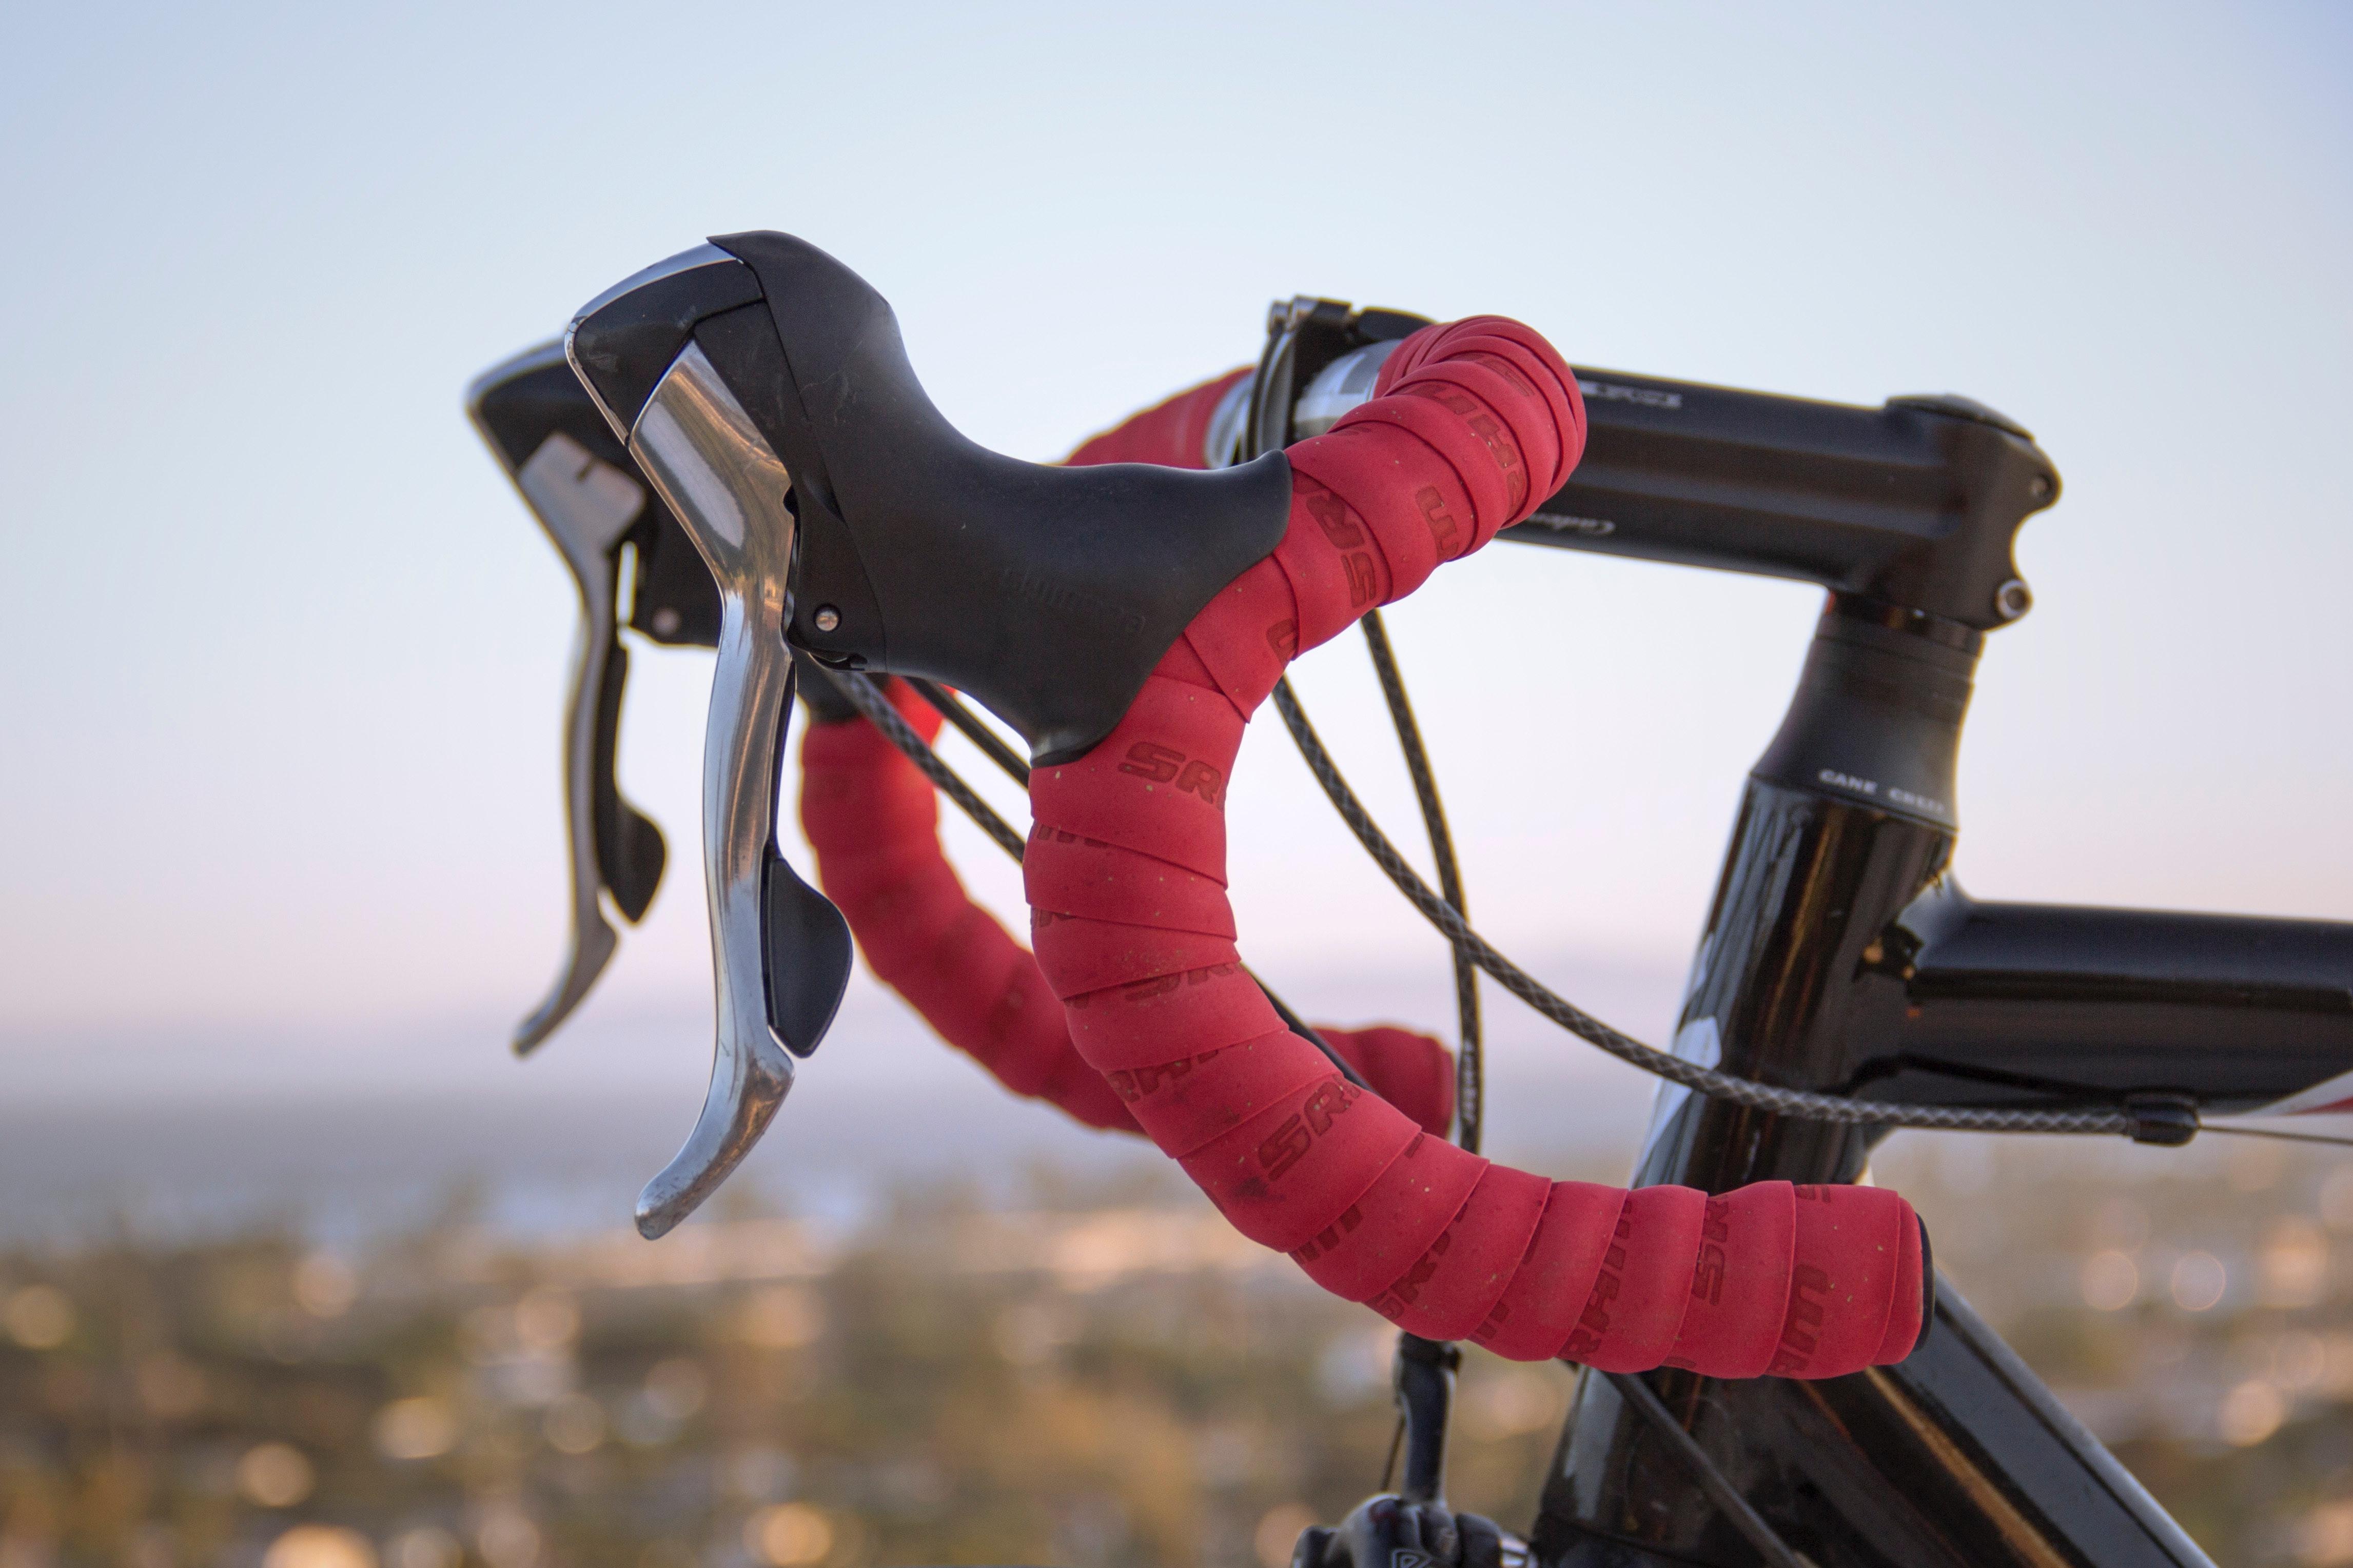 bicycle-breaks-exercise-6946